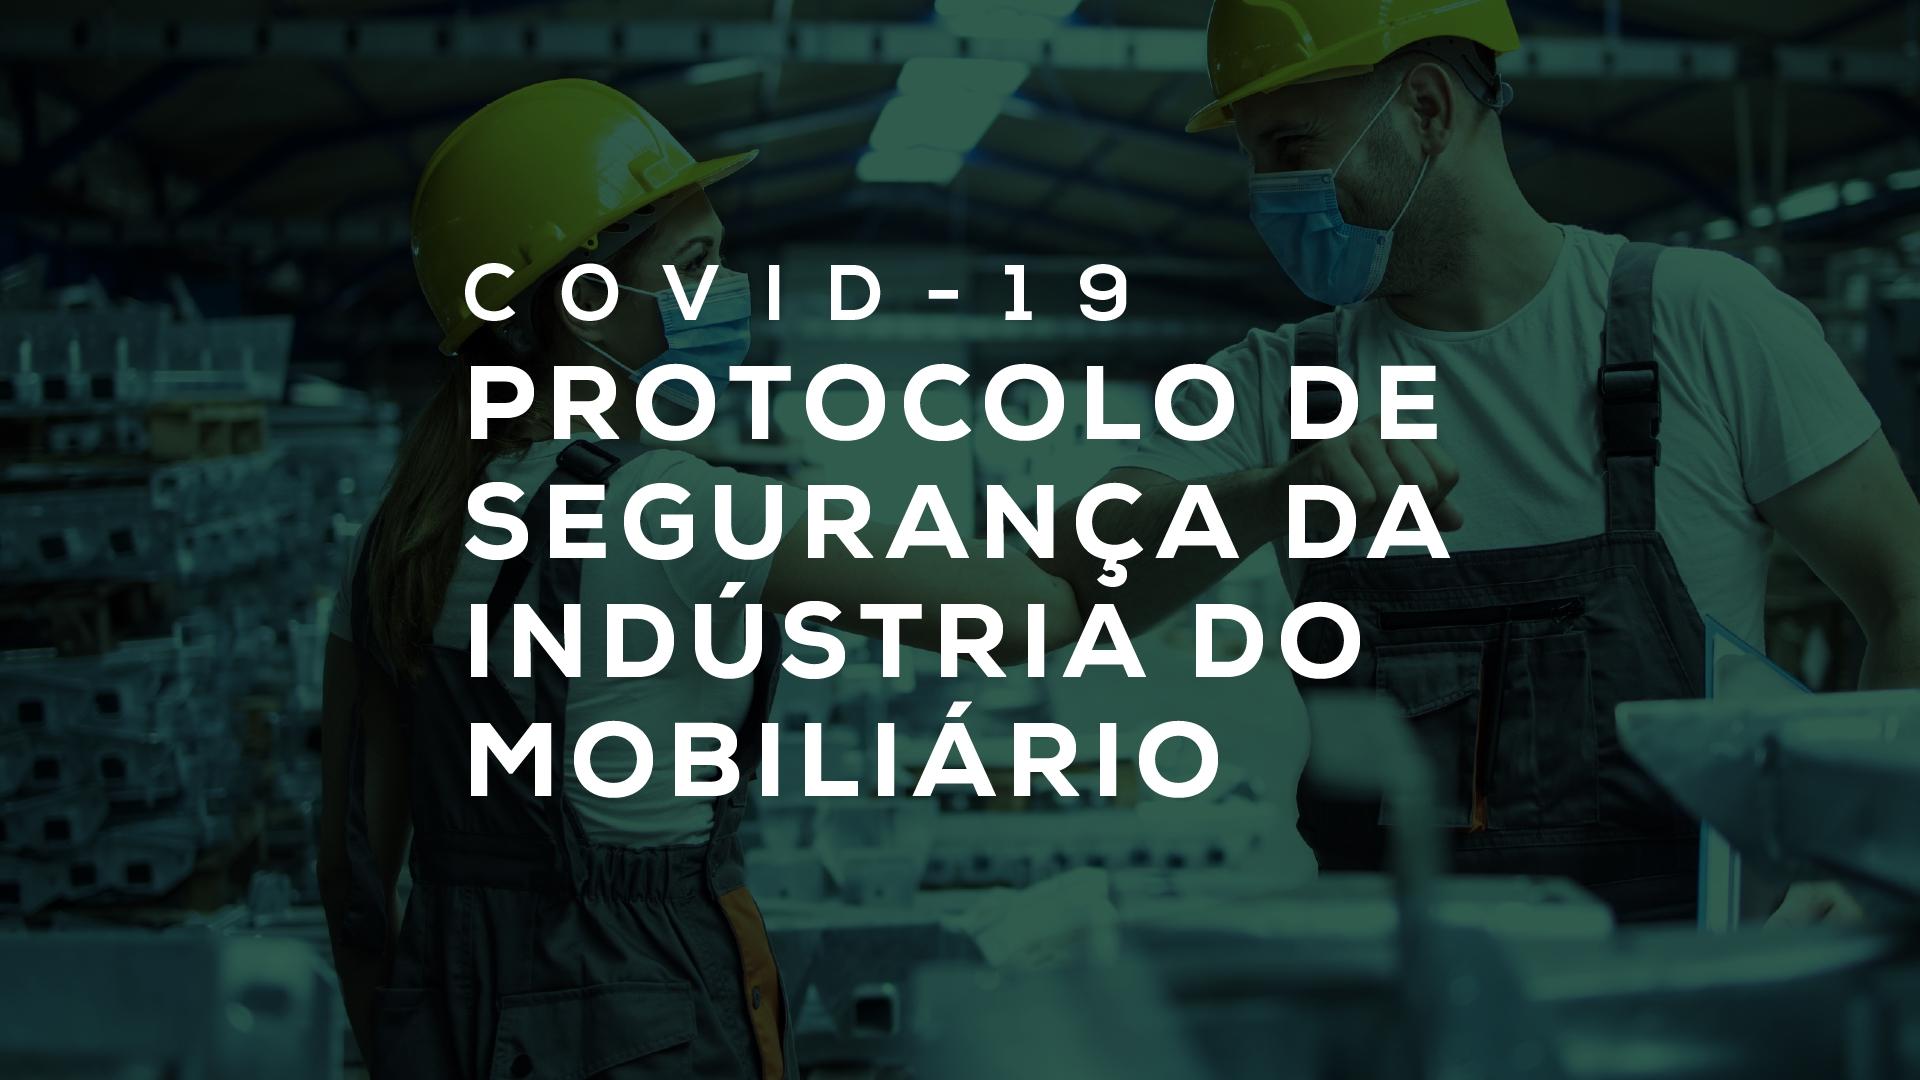 acervo_covid 04. Protocolo de Seguranca Atividades da Industria do Mobiliario